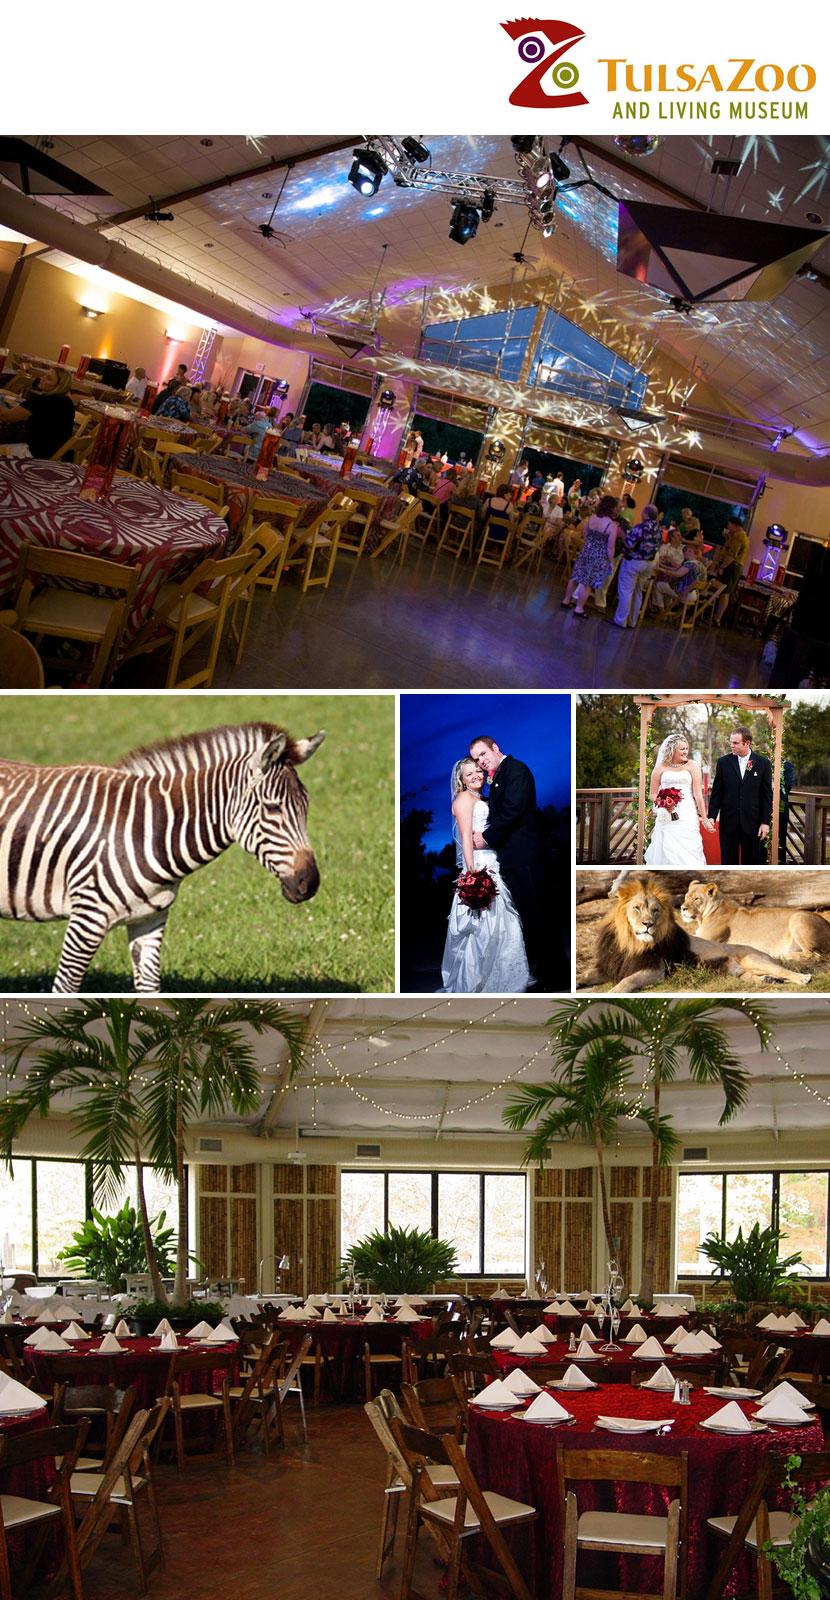 Luxe Location Tulsa Zoo Amp Living Museum